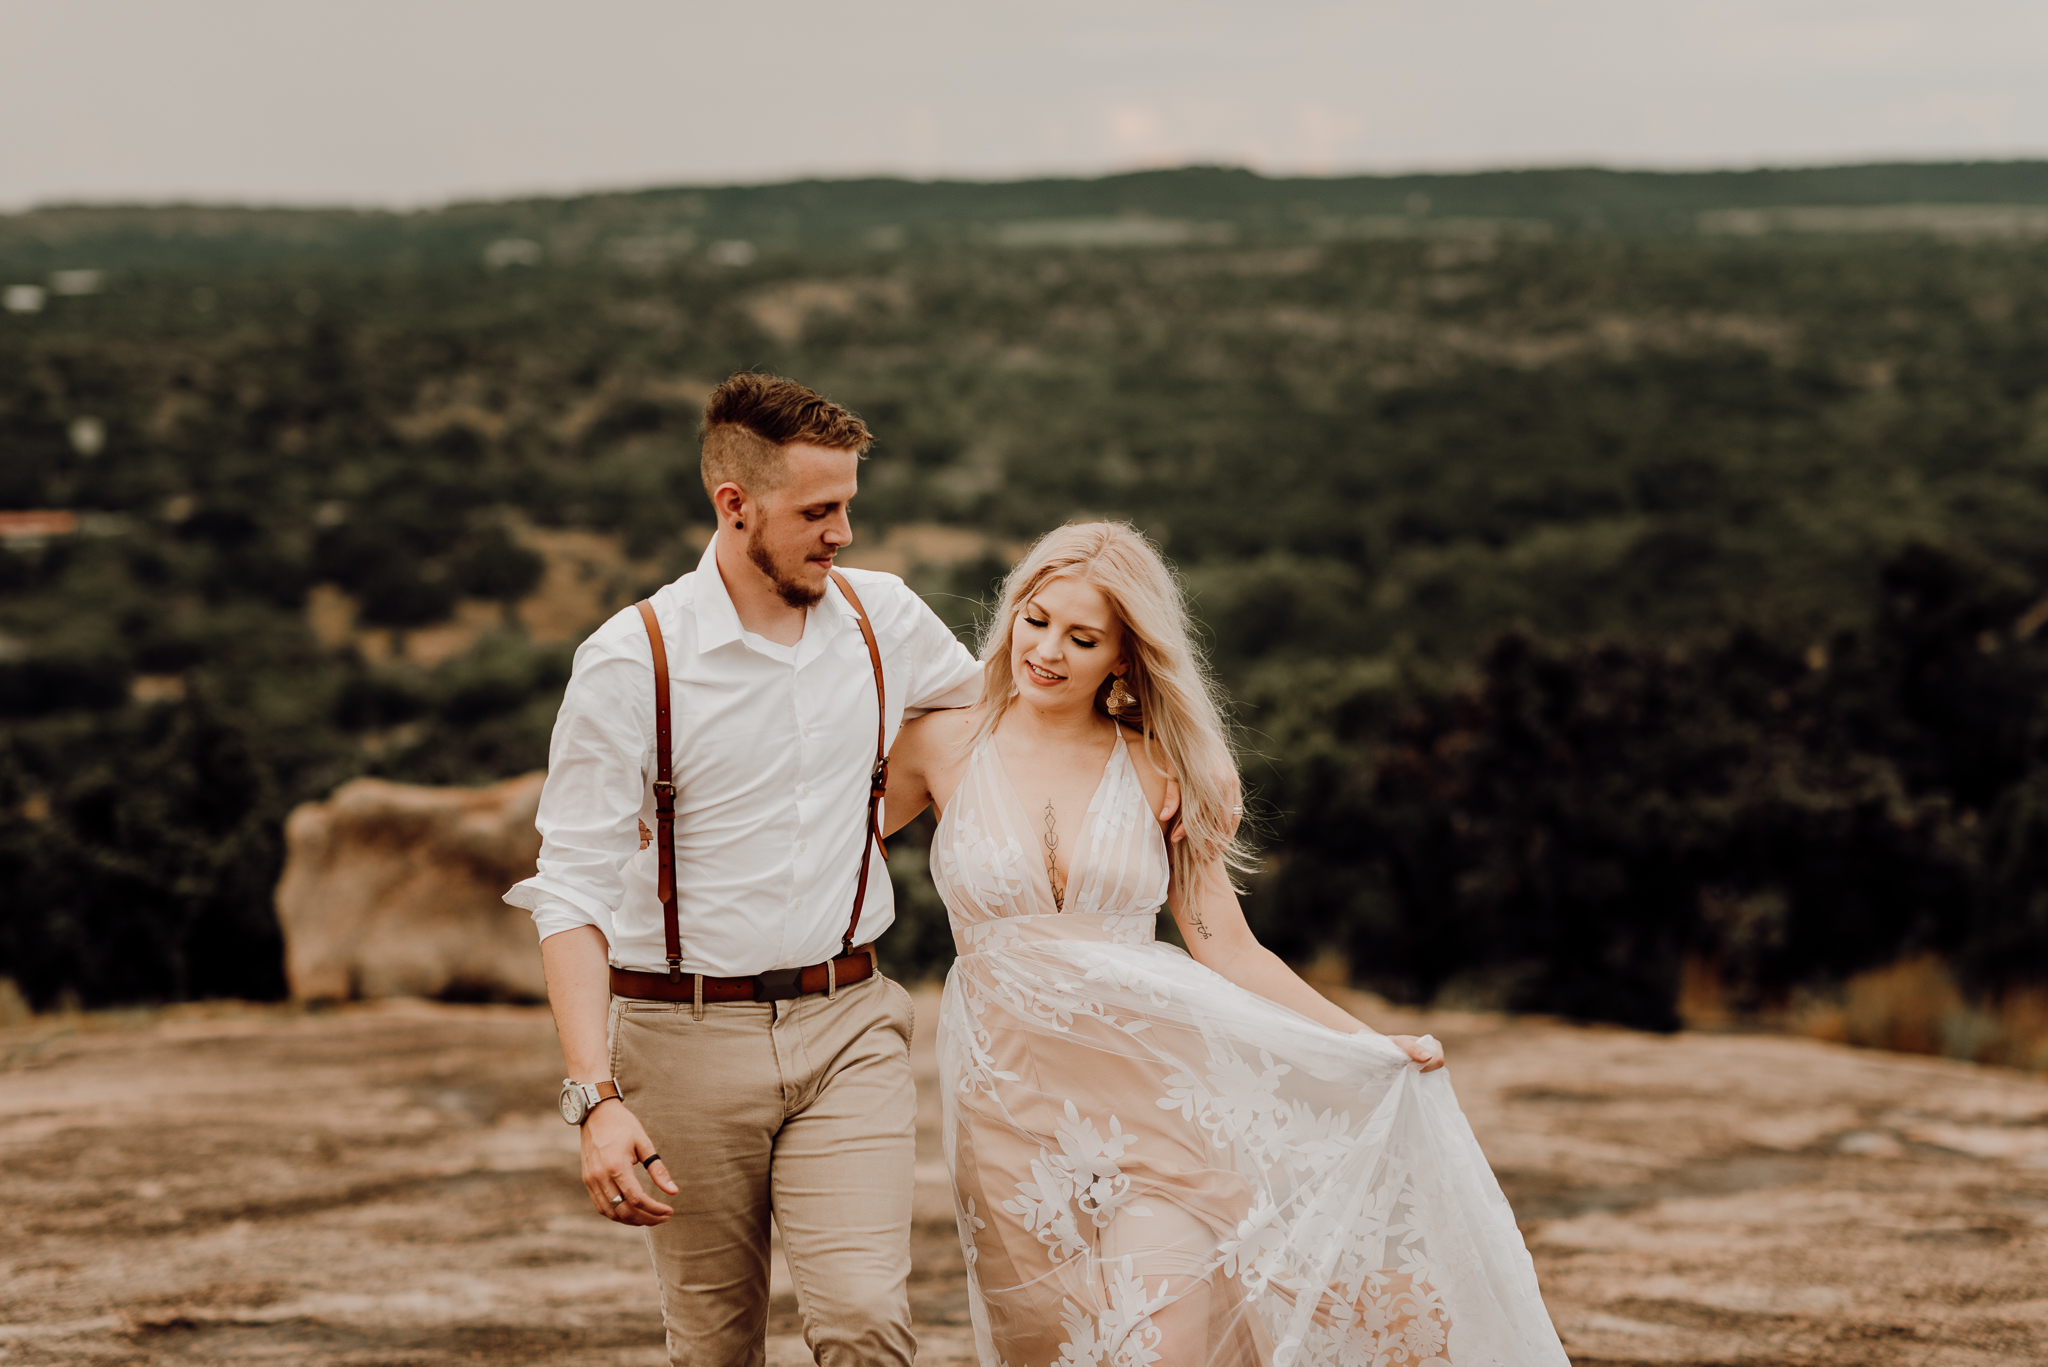 texas-elopement-photographer-enchanted-rock-31-blog.jpg